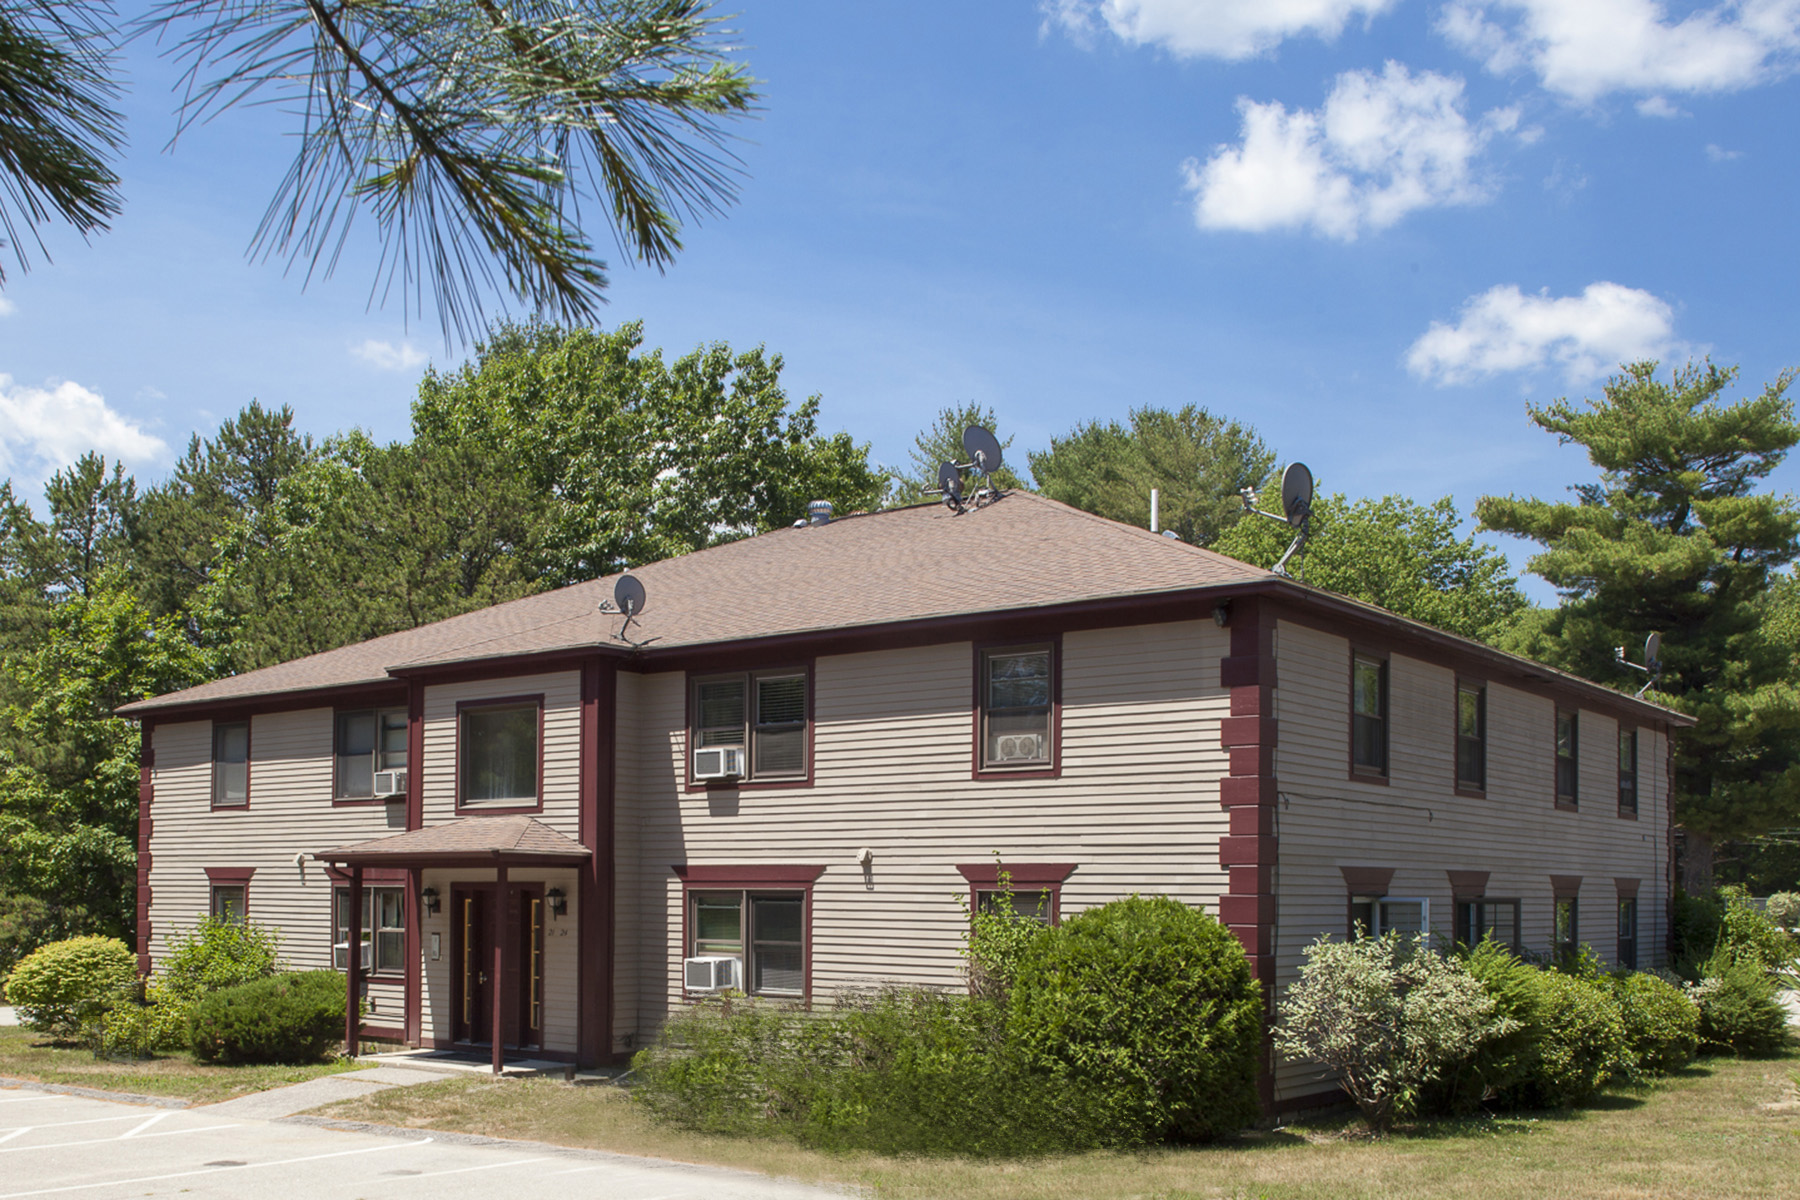 39 Smithwheel Rd, Old Orchard Beach, ME 04064